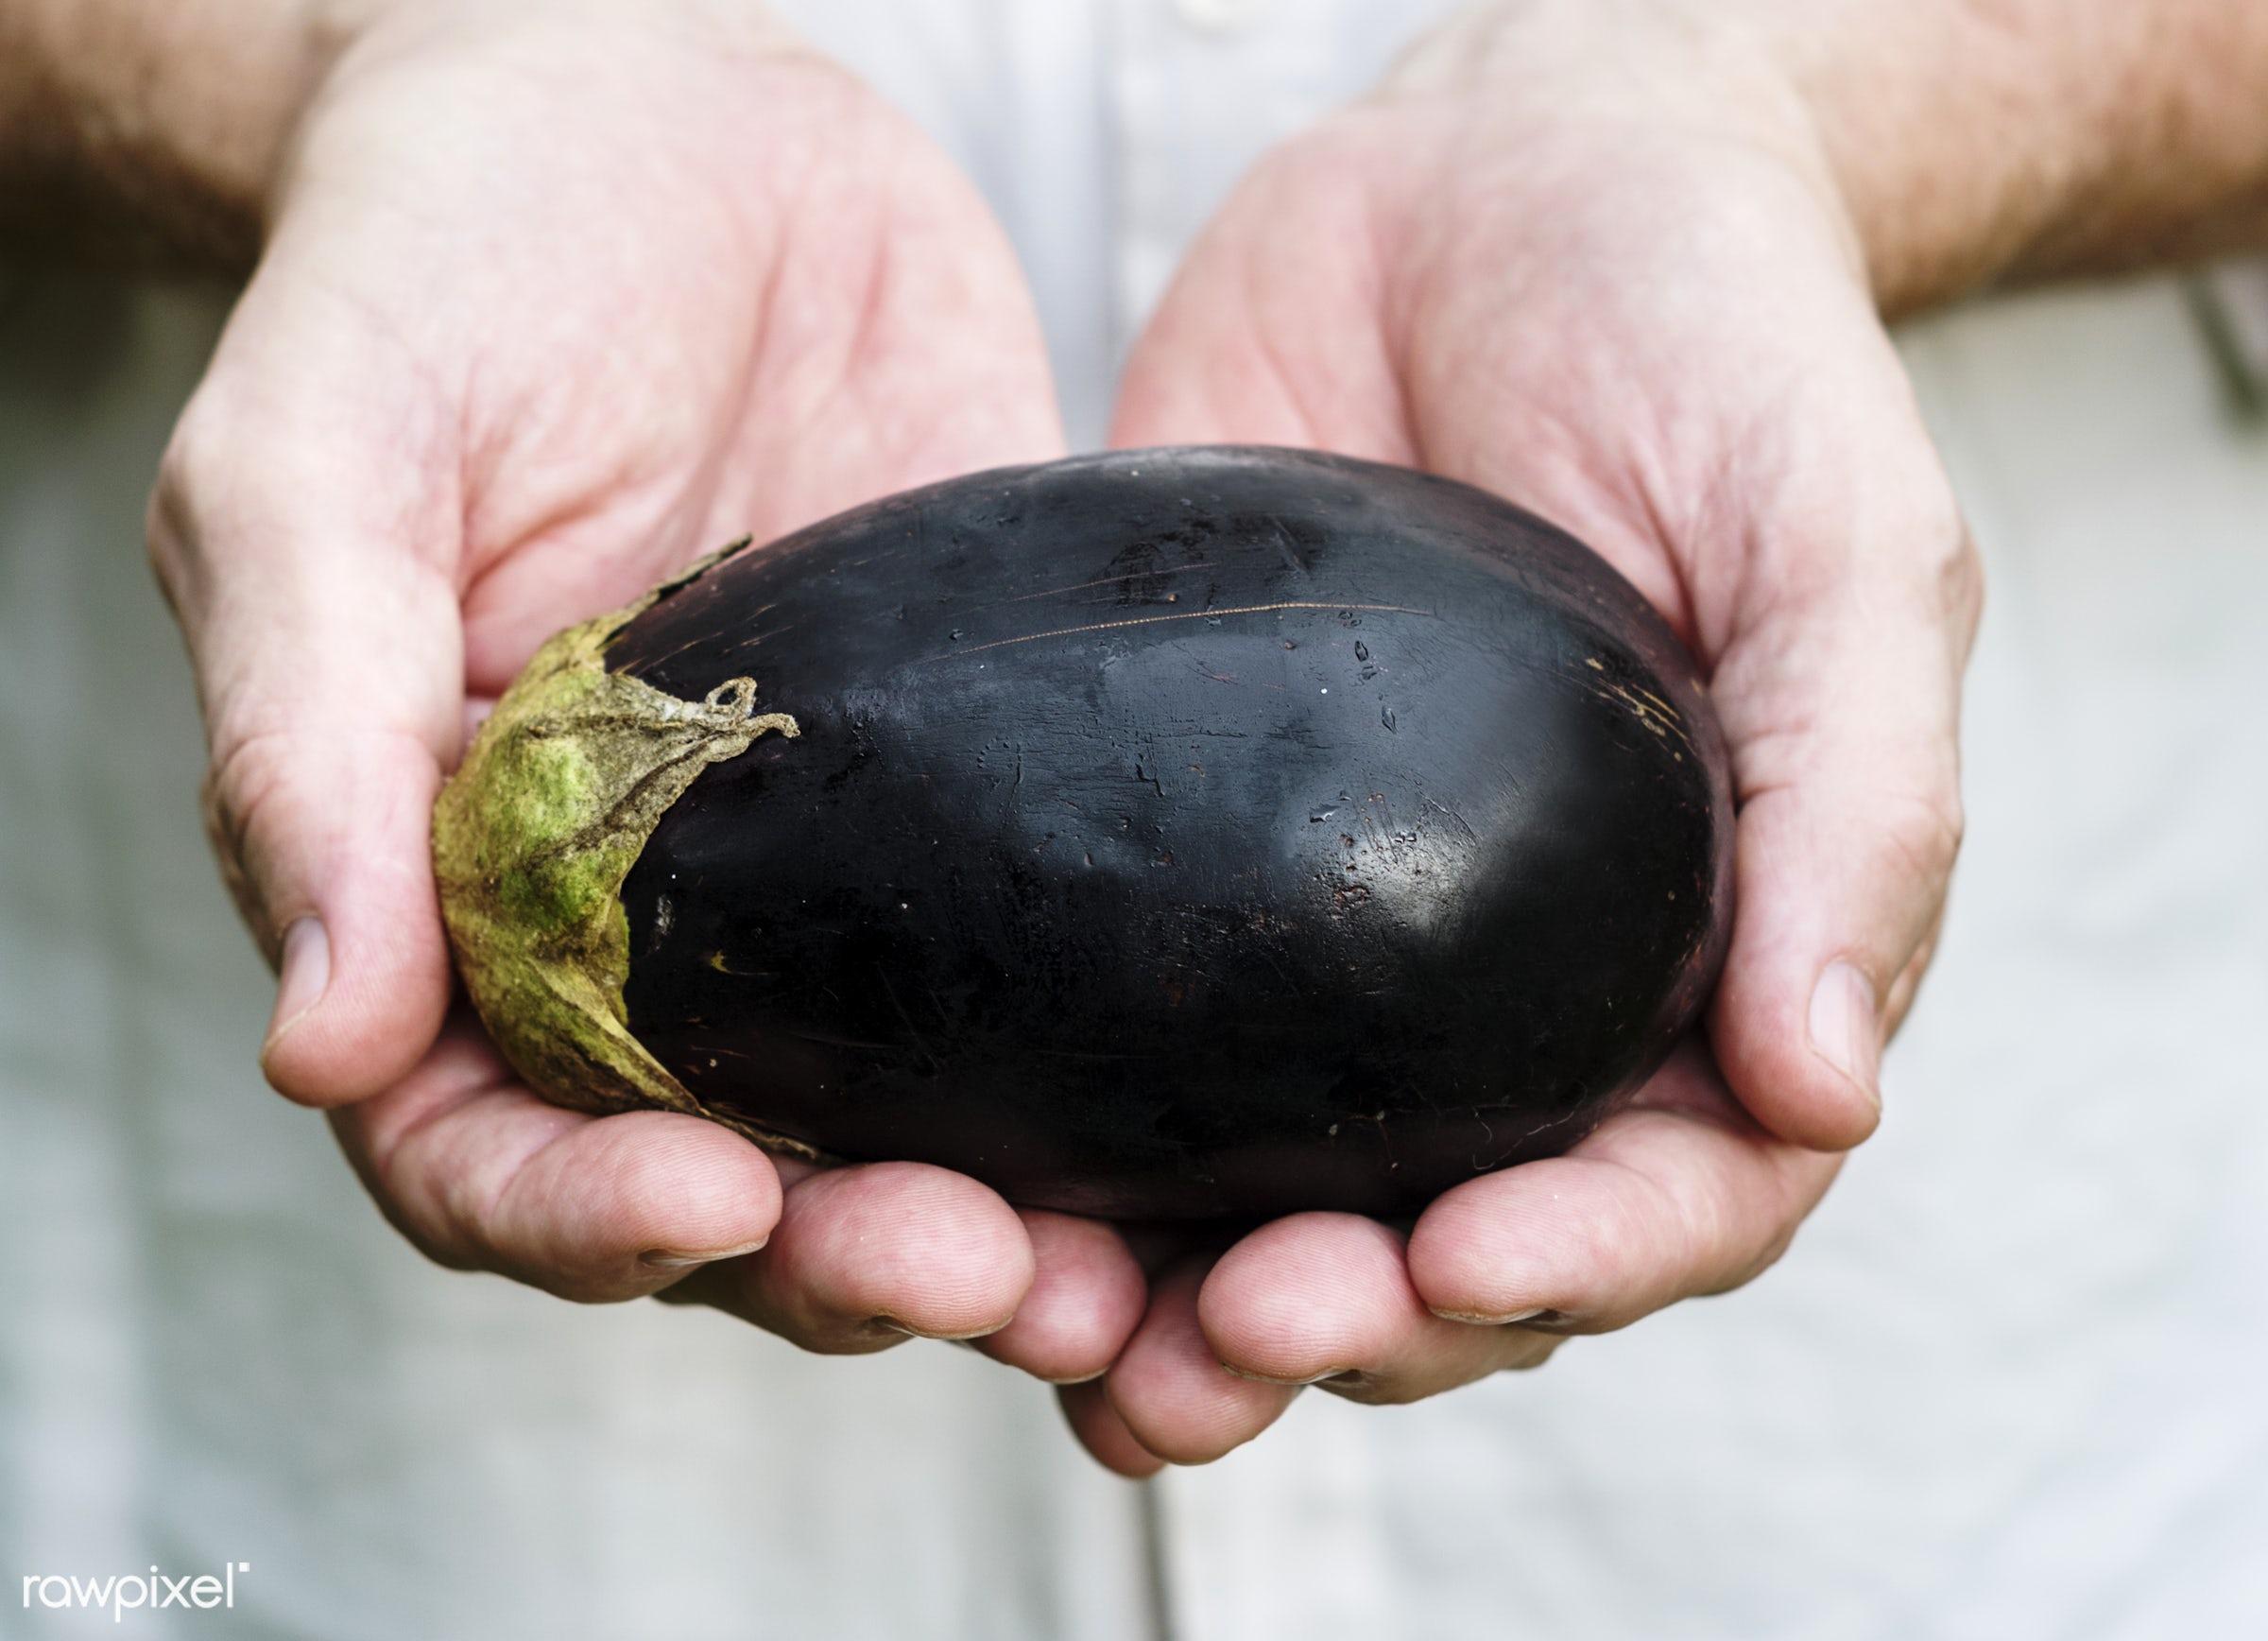 Fresh eggplant vegetable - raw, holding, eggplant, nature, hands, fresh, closeup, organic, healthy, harvest, vegetable,...